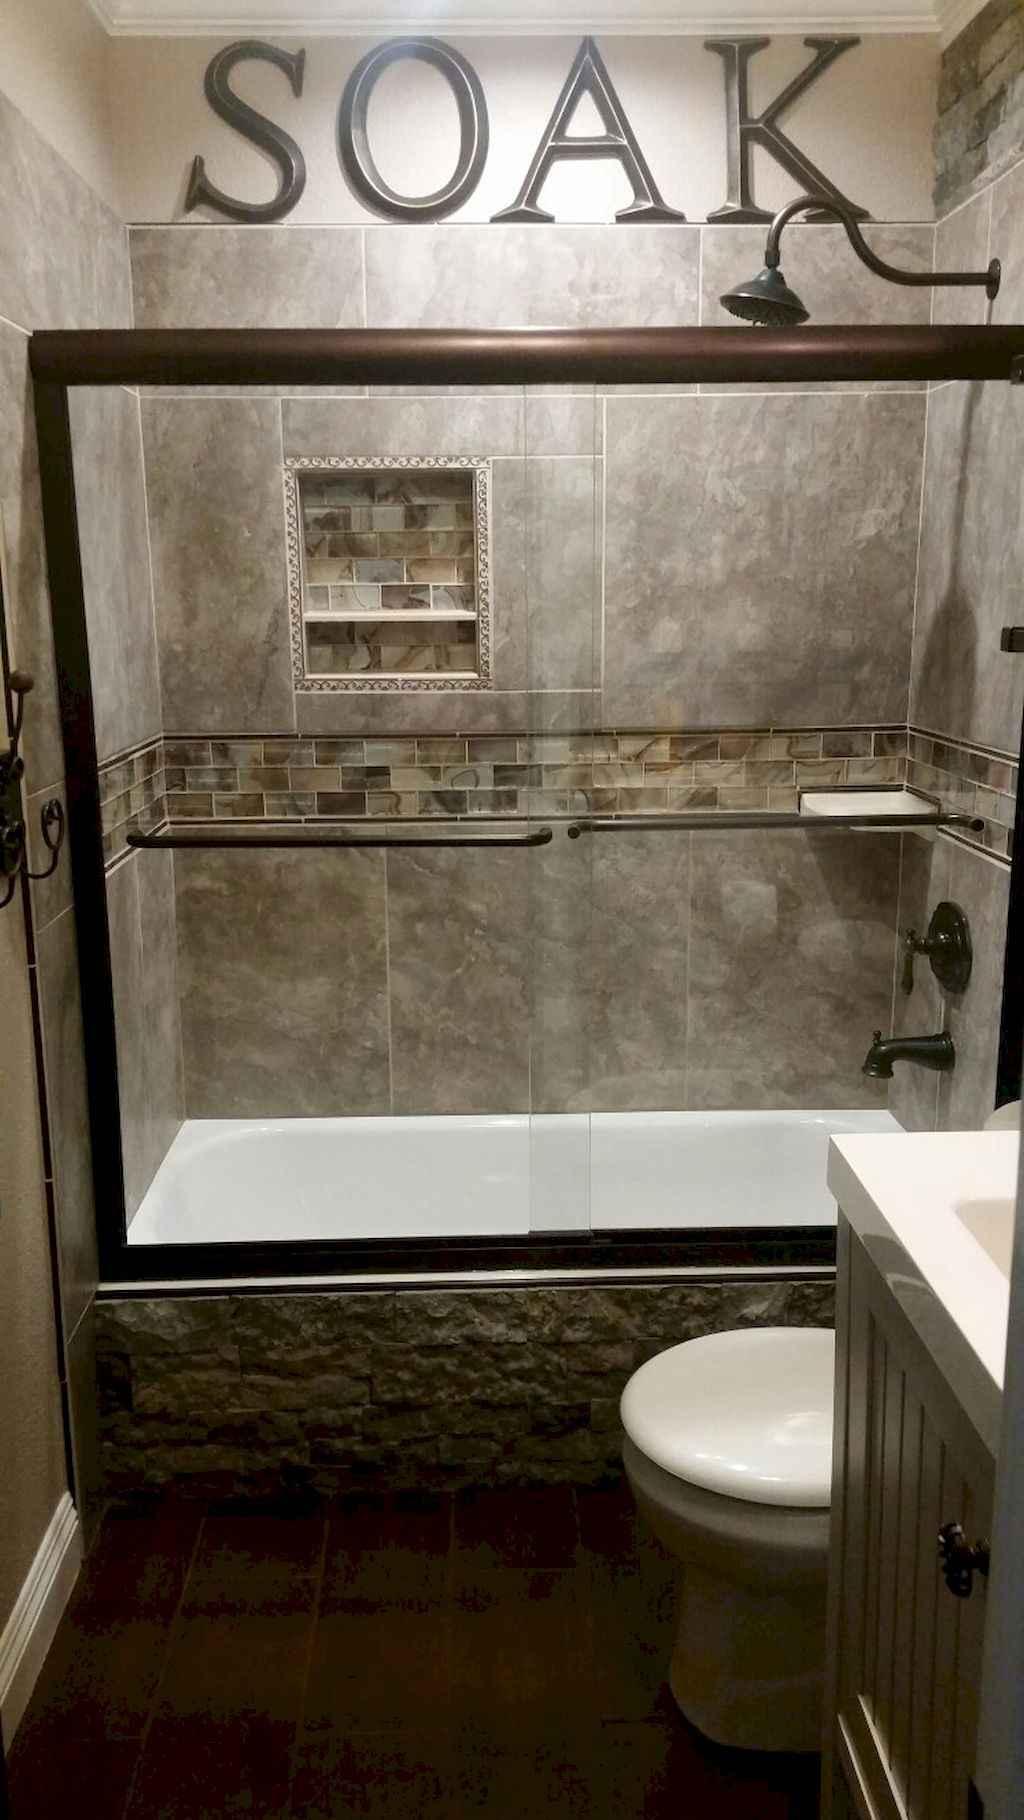 Inspiring apartment bathroom remodel ideas on a budget (16)